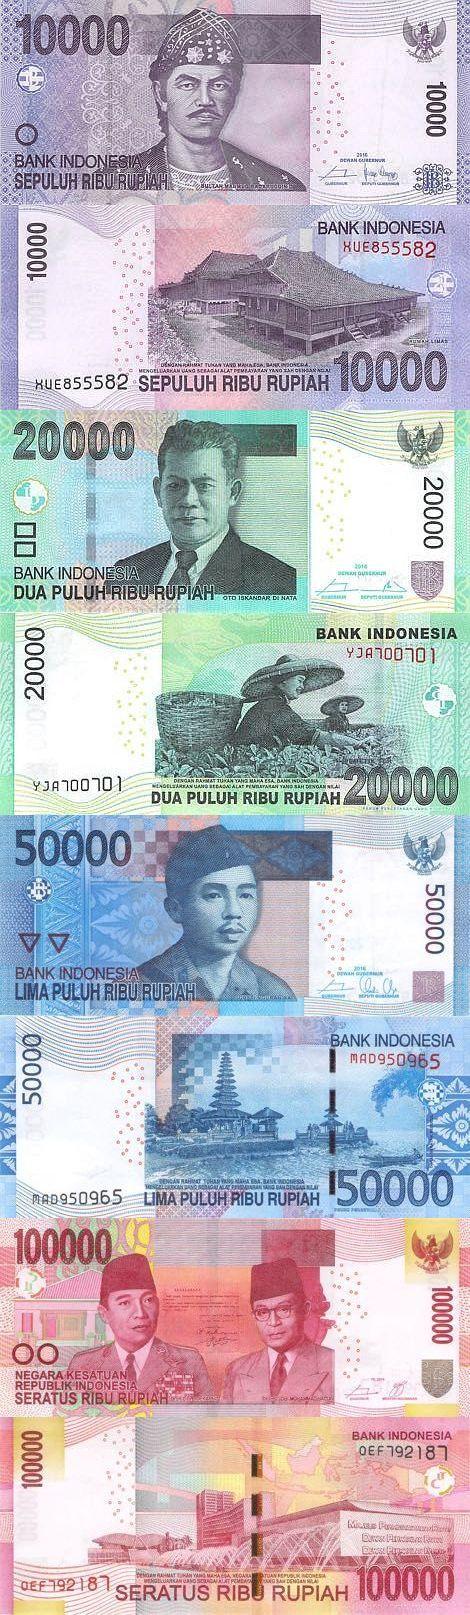 Indonesia 10,000-20,000-50,000-100,000 Rupiah 2016 | #World